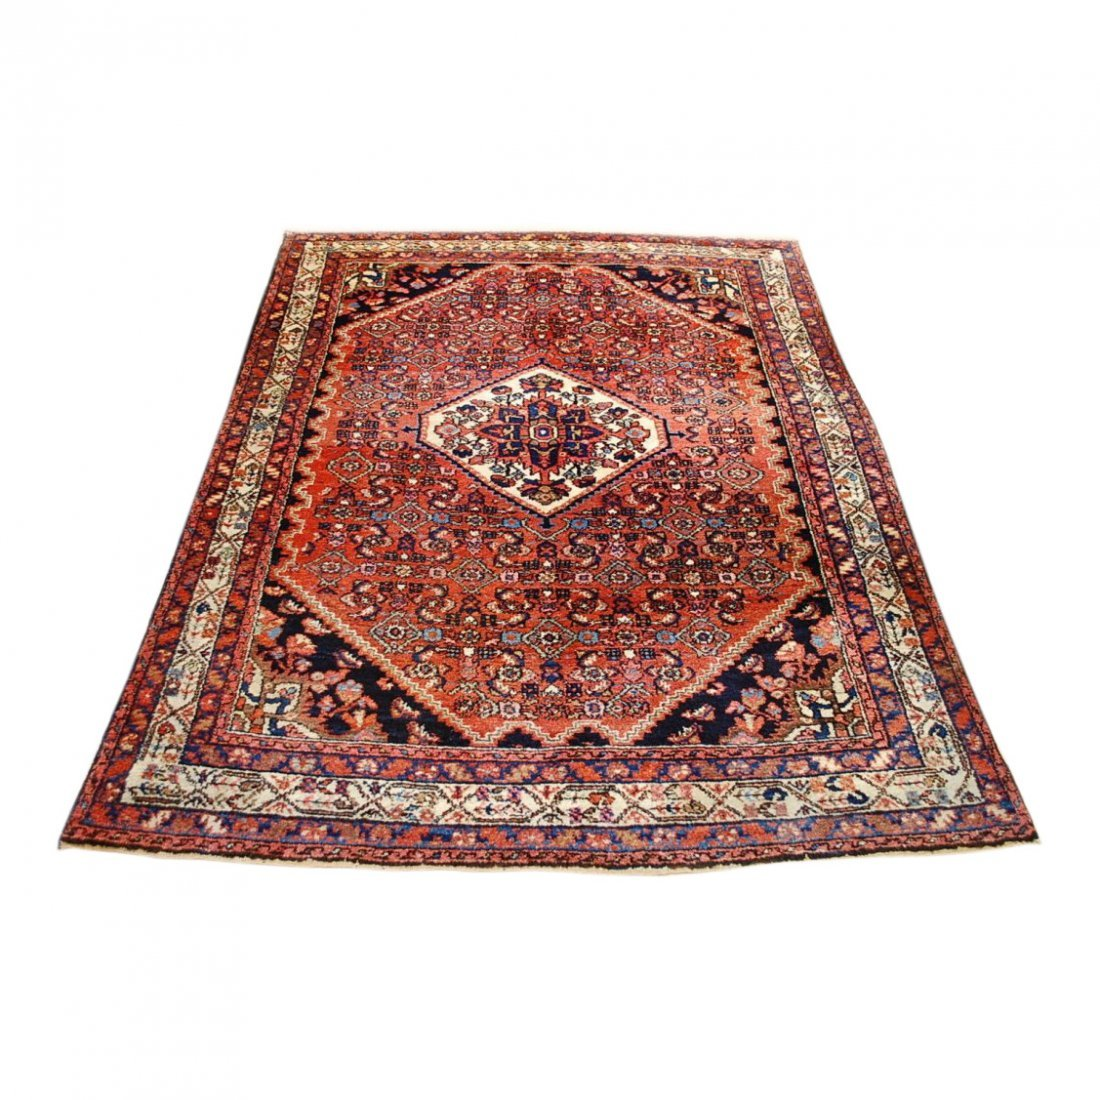 Antique Persian Malayer Rug 4.10x6.4